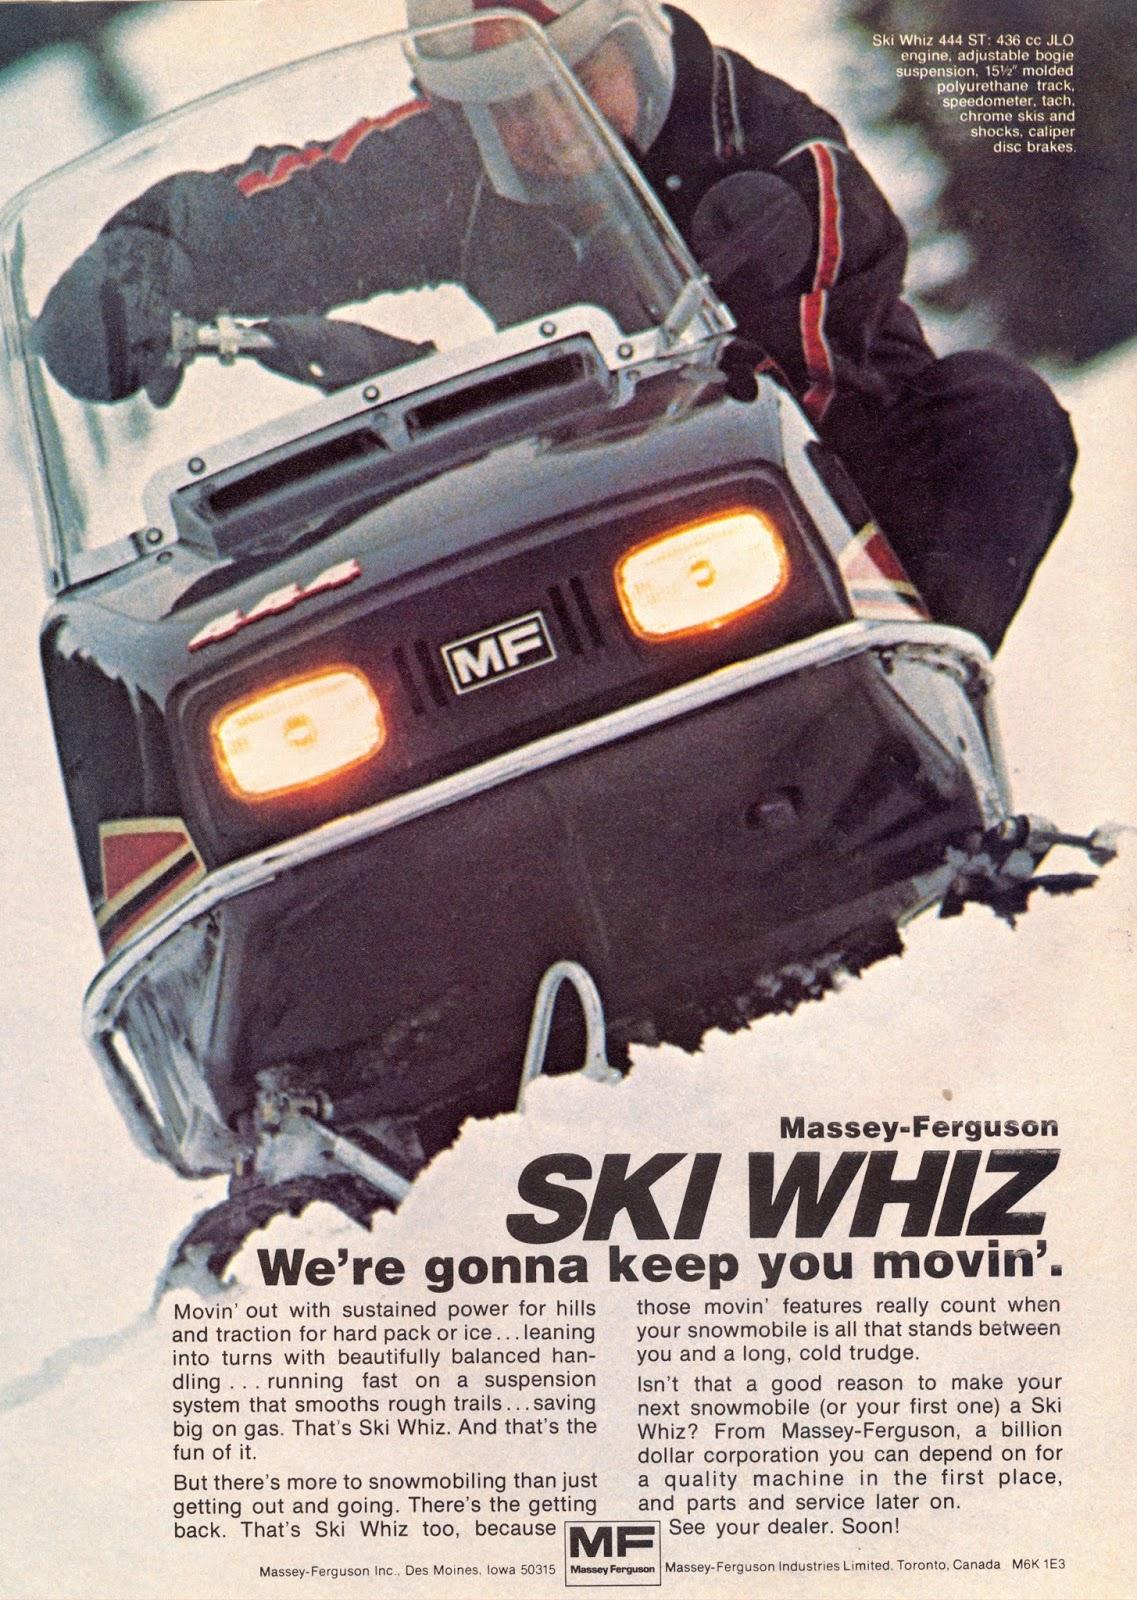 Ski whiz snowmobiles for sale - 1975 Massey Ferguson Ski Whiz Ad